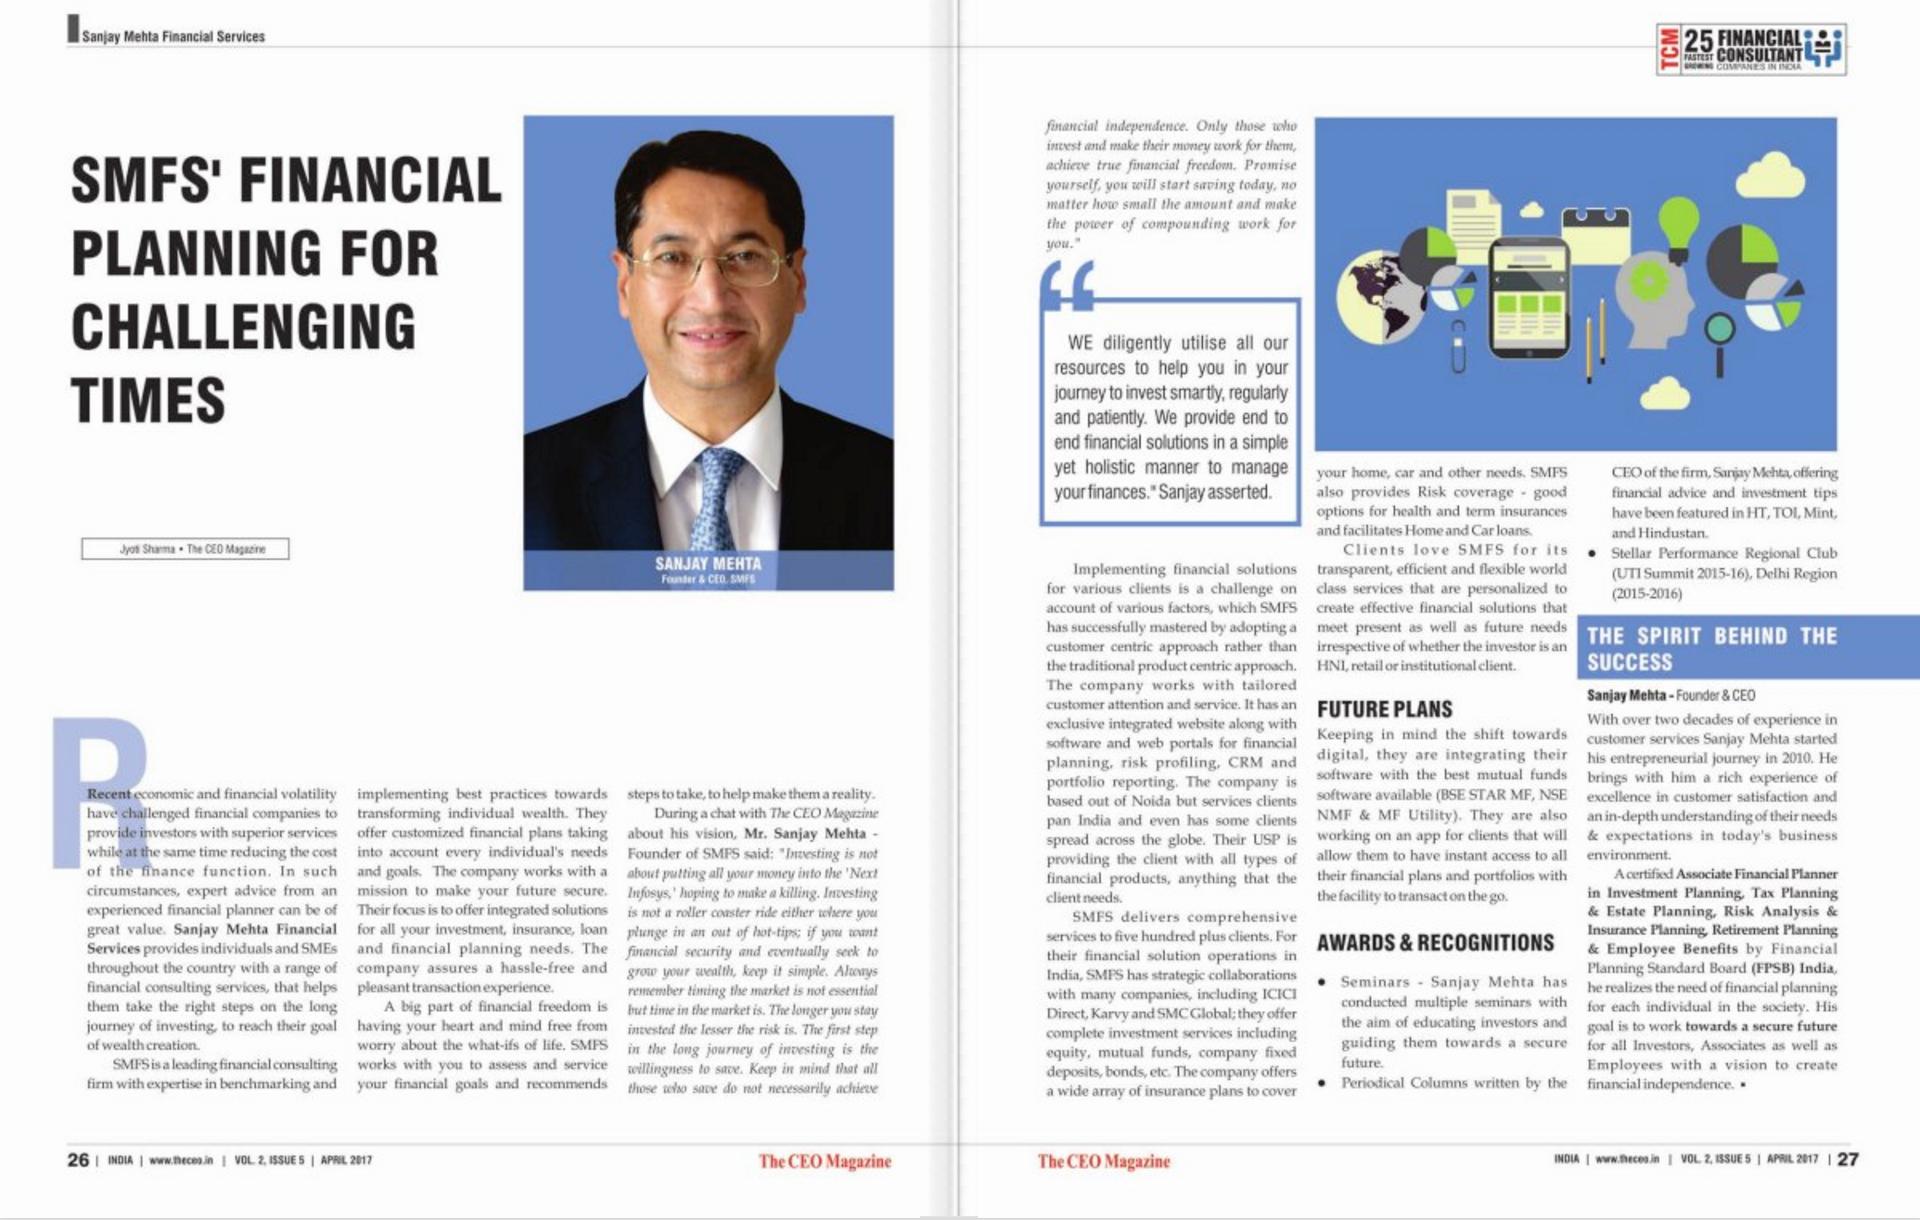 SMFS - CEO Magazine Feature - April 2017